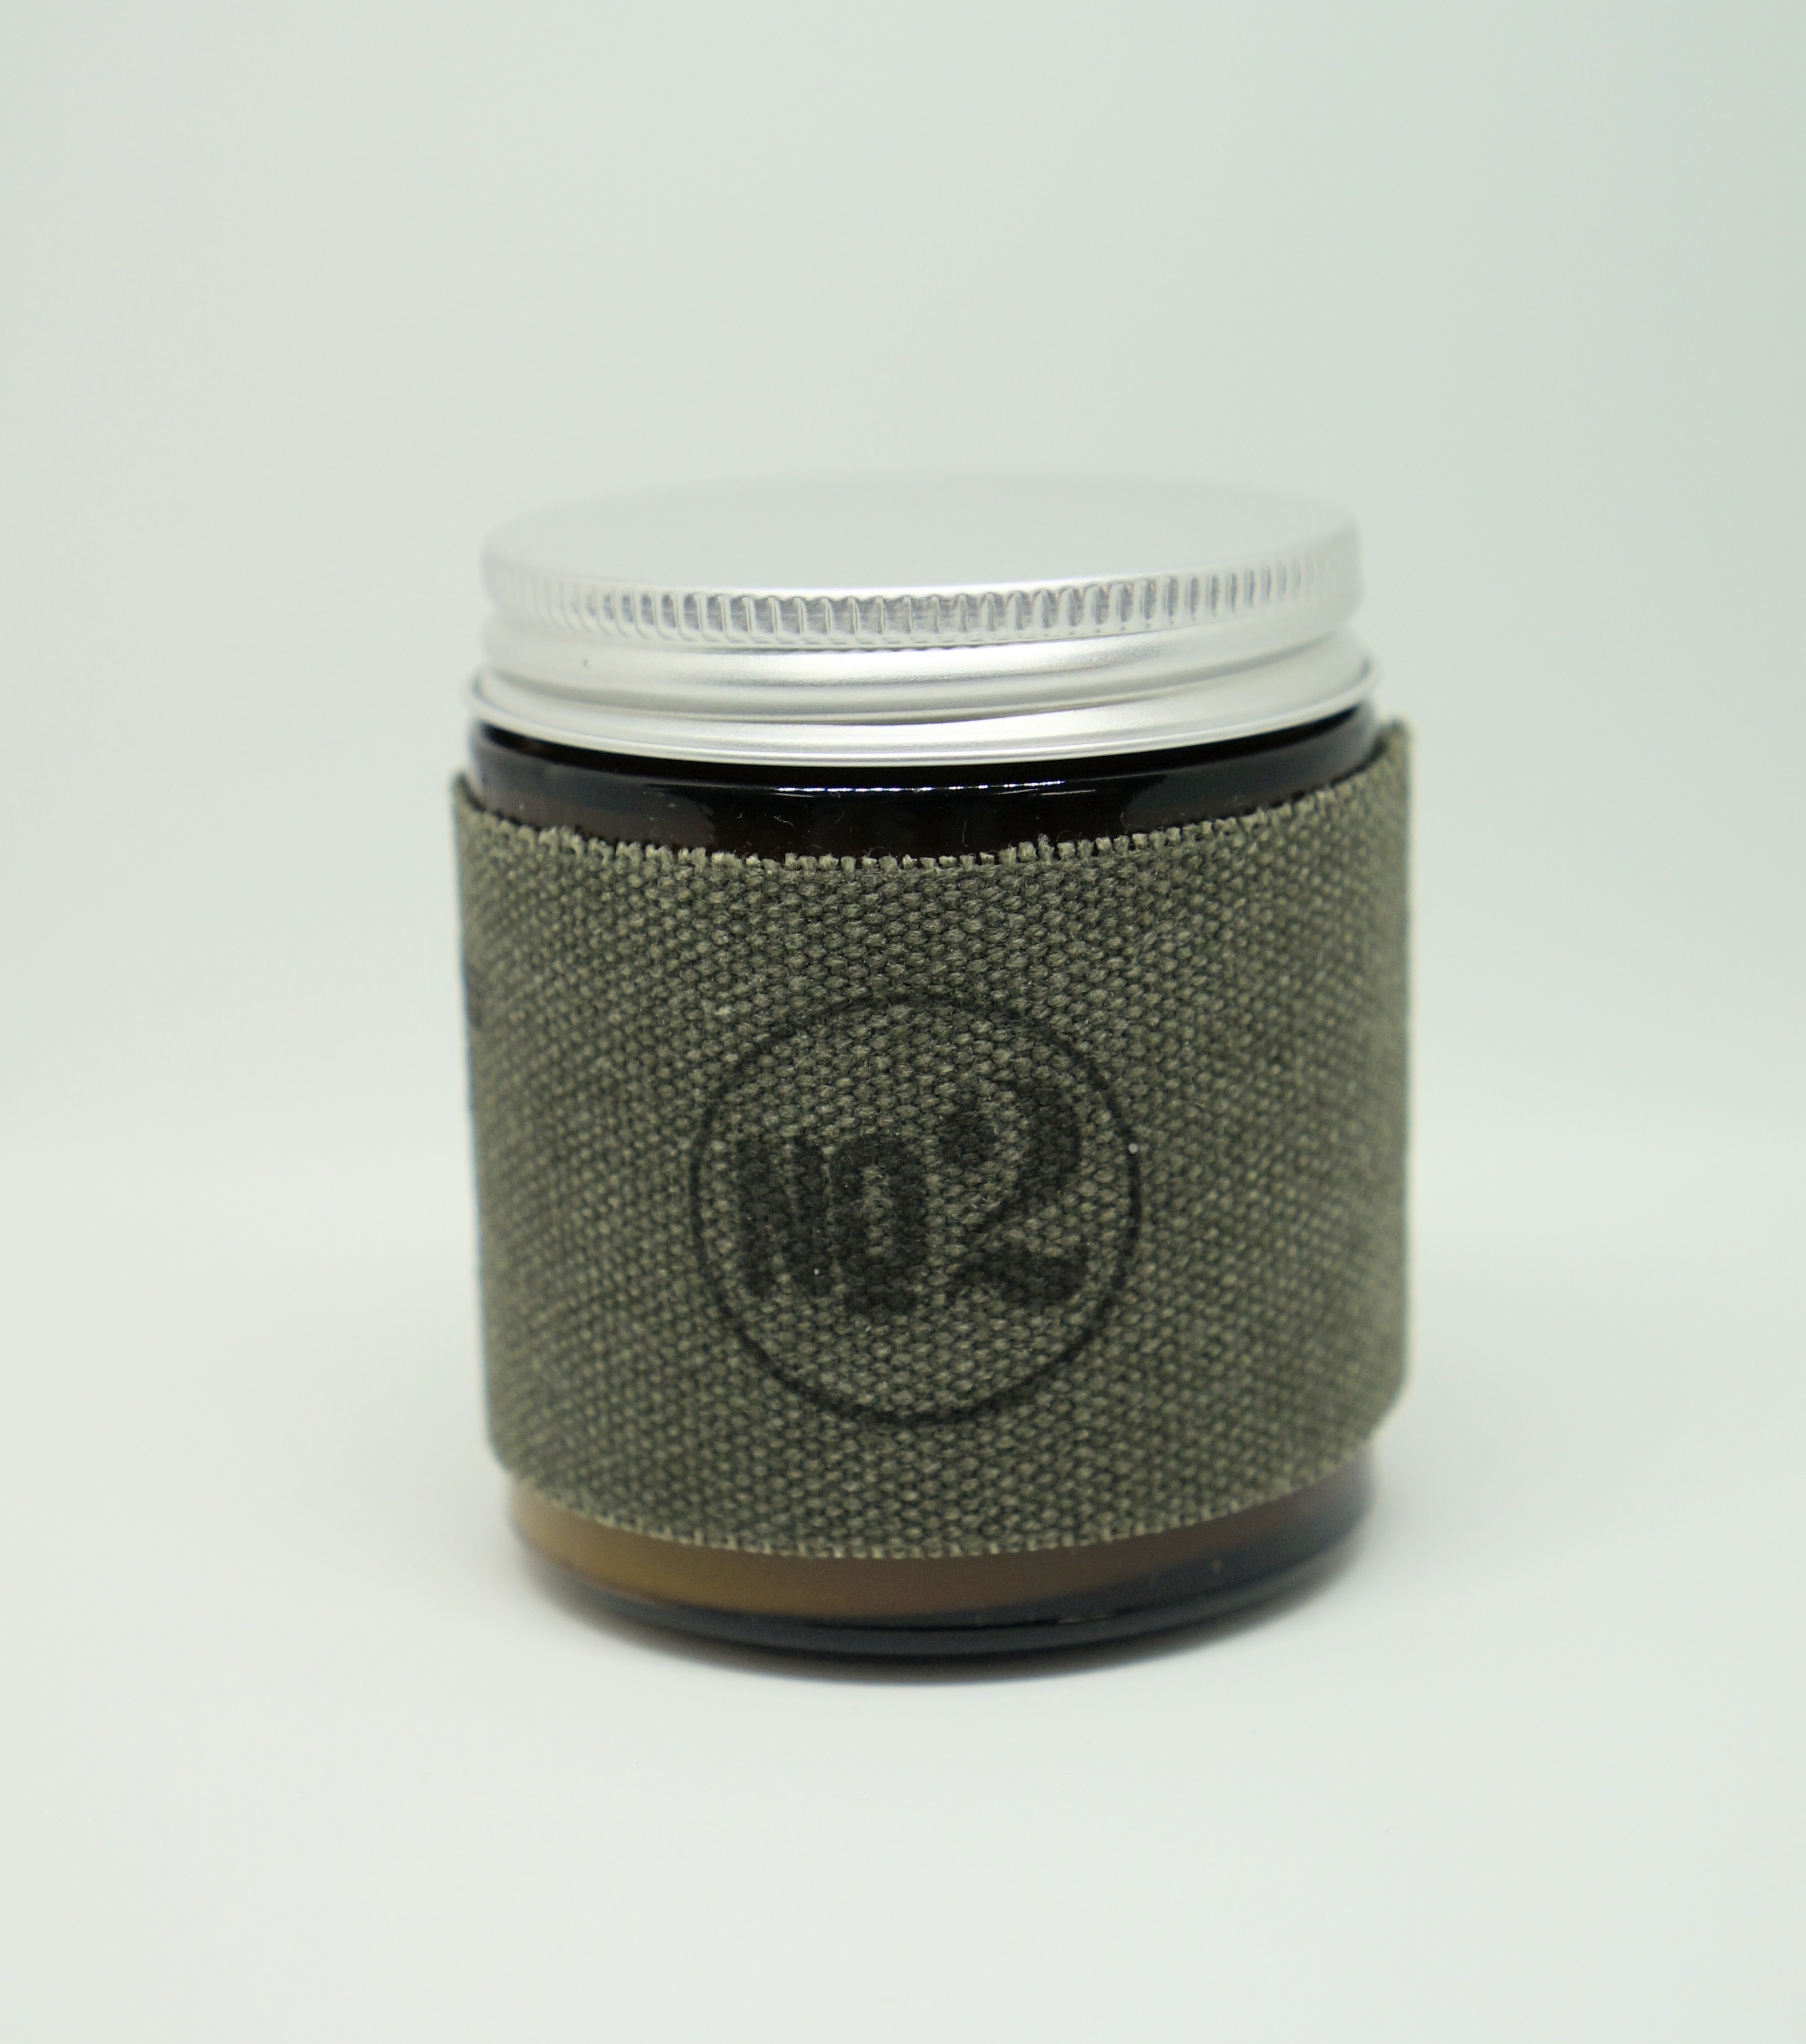 4oz Amber Jar Candle -LEMONGRASS AND SAGE- キャンドル Candles - 画像2